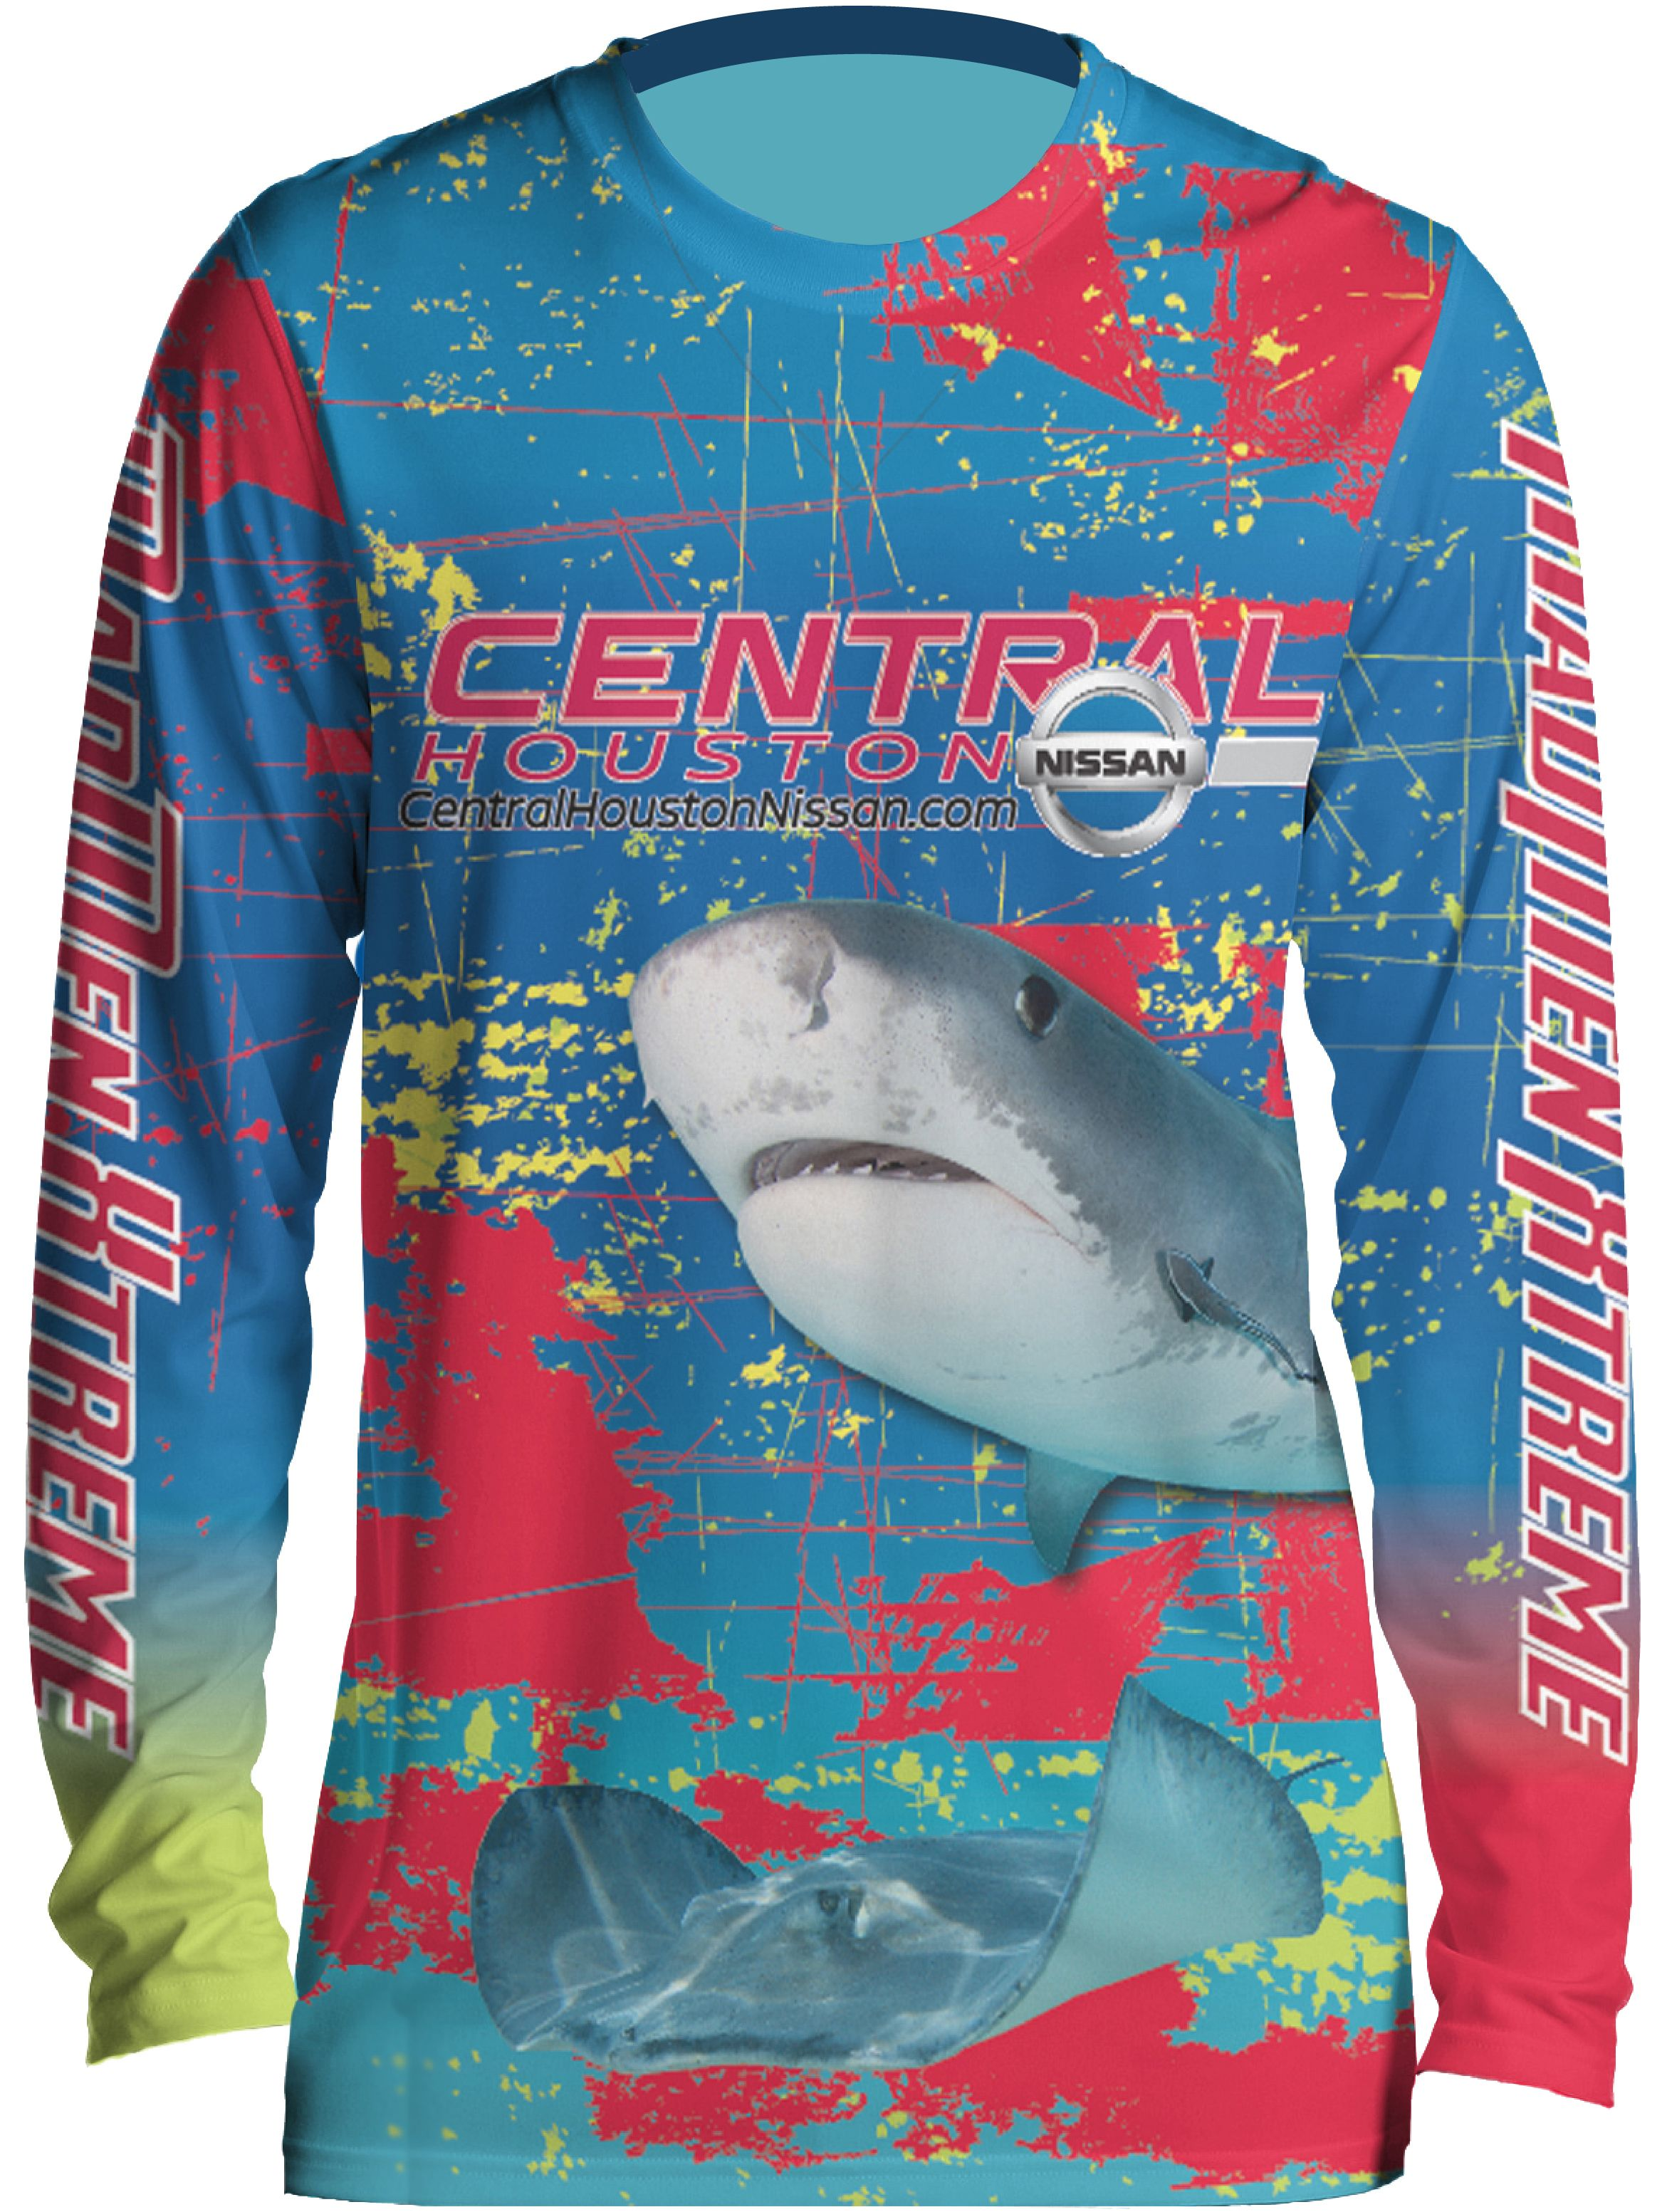 Madmen Xtreme Have Their New Custom Tournament Upf50 Fishing Shirts